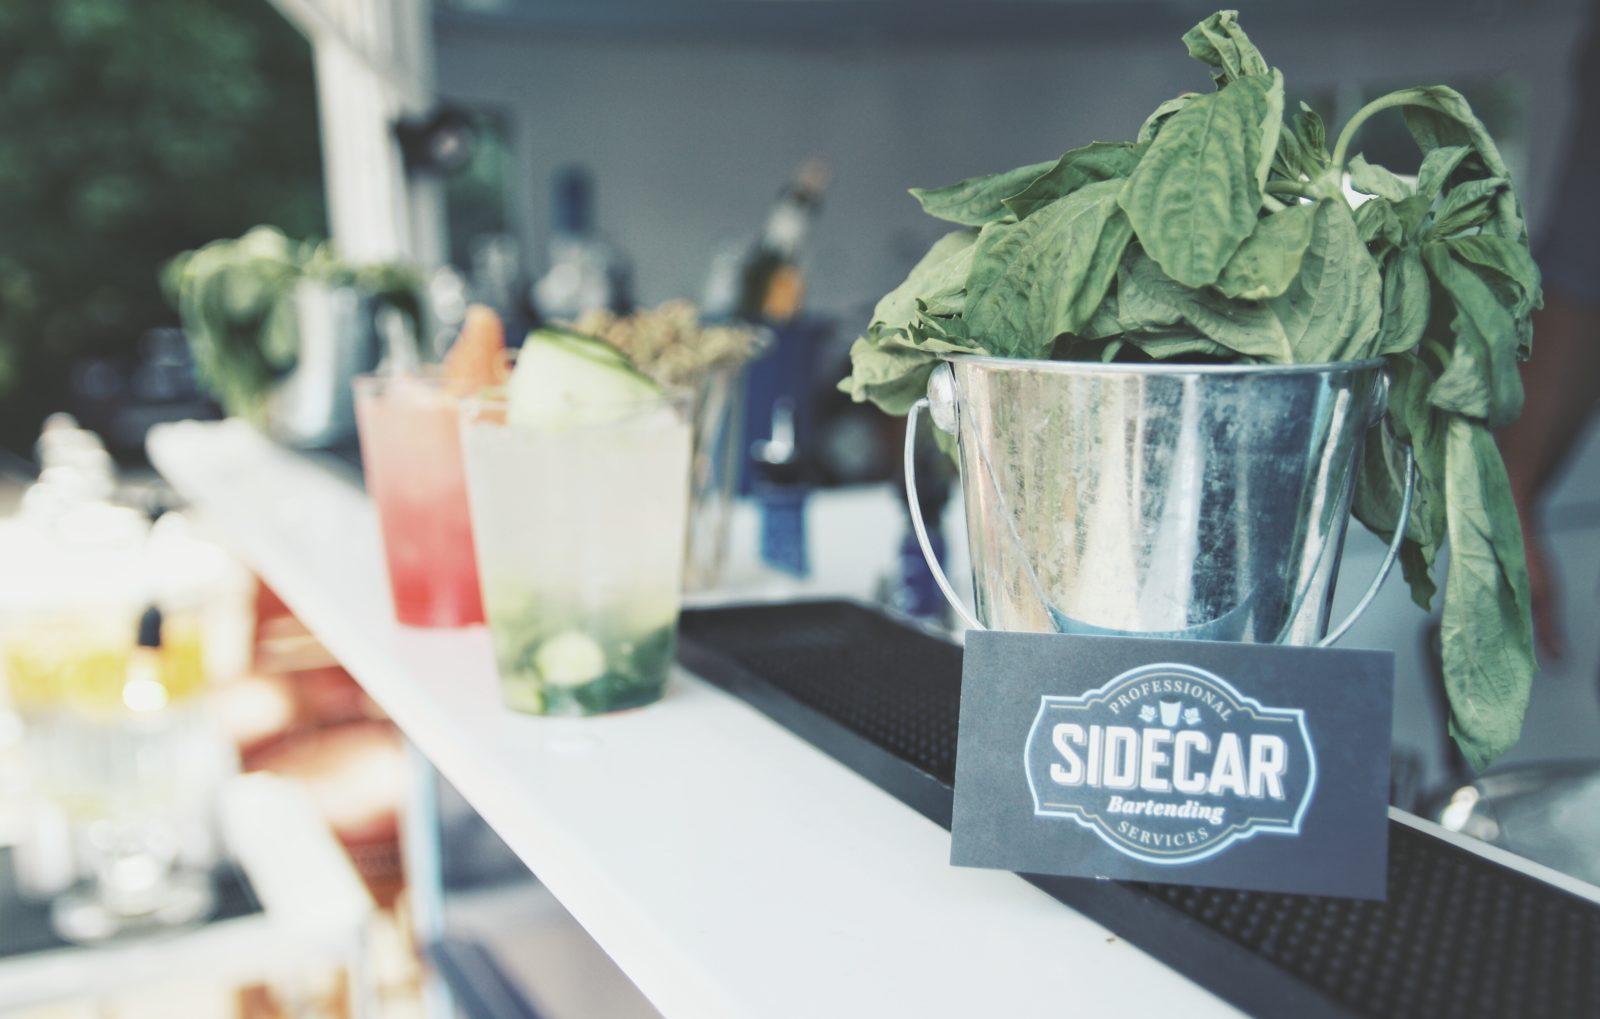 sidecar-ponybar-image-6